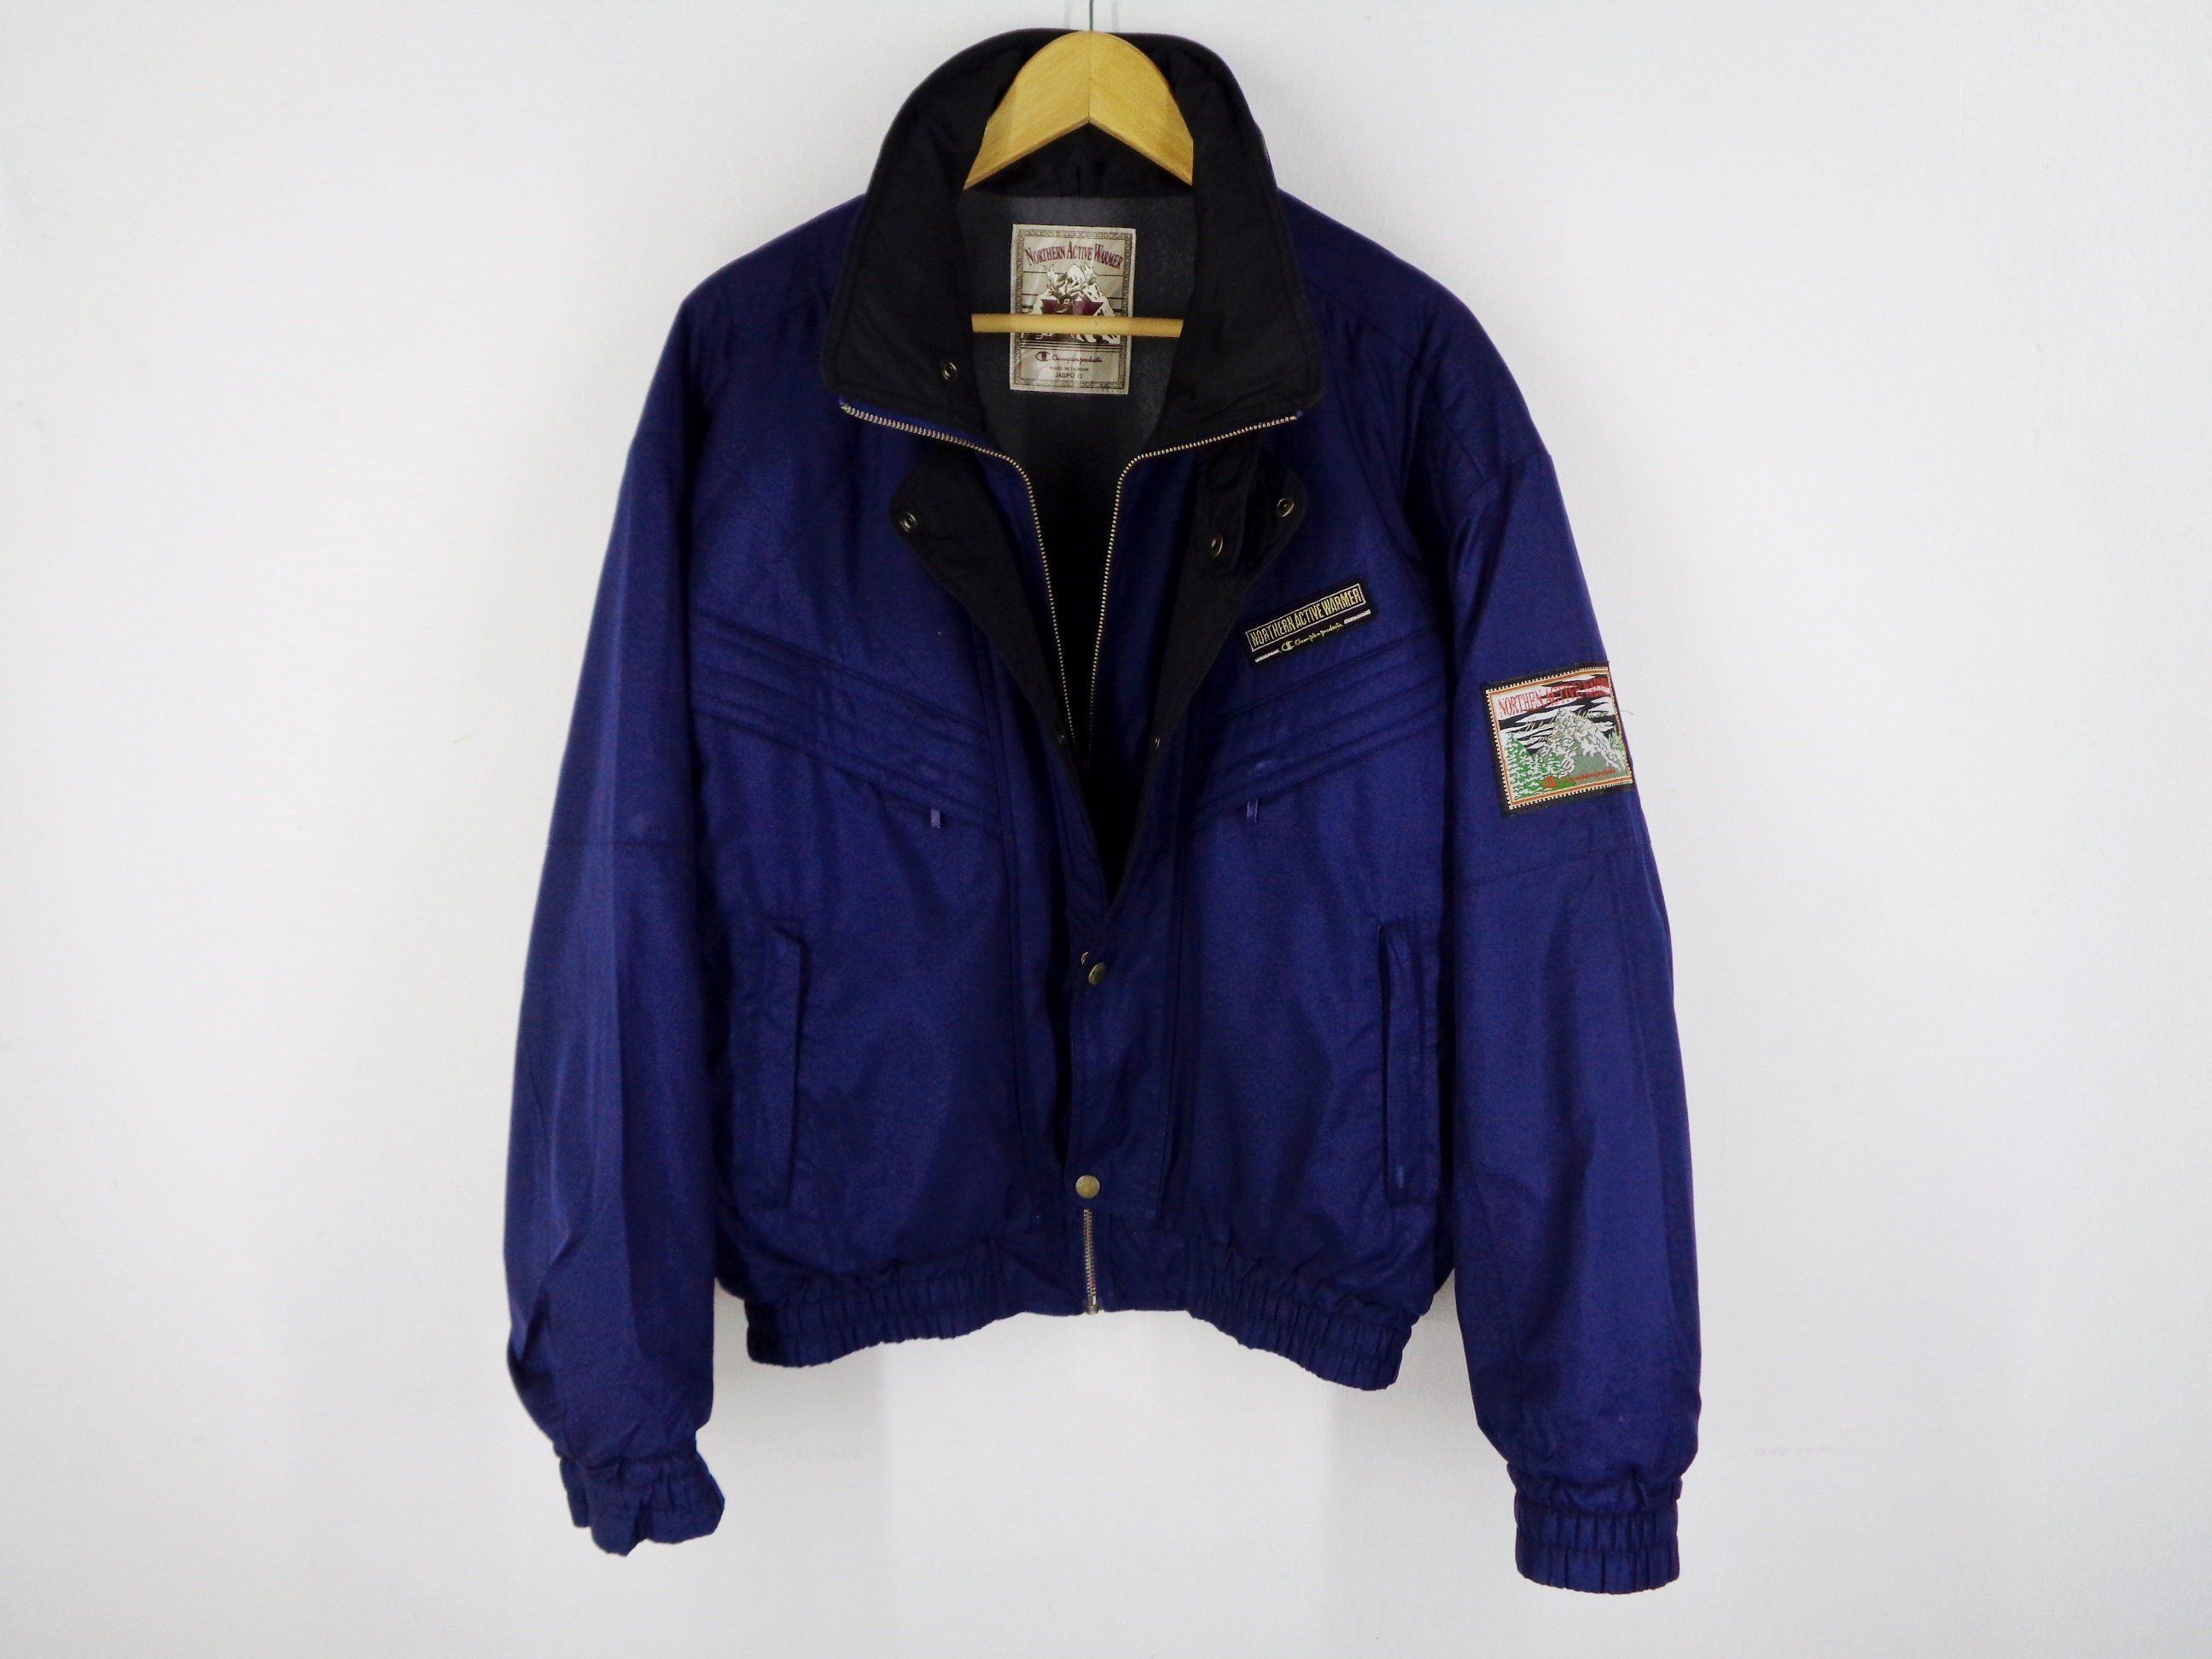 Champion Jacket Vintage Size Jaspo M Champion Windbreaker 90s Champion Vintage Windbreaker Jacket Size LXL